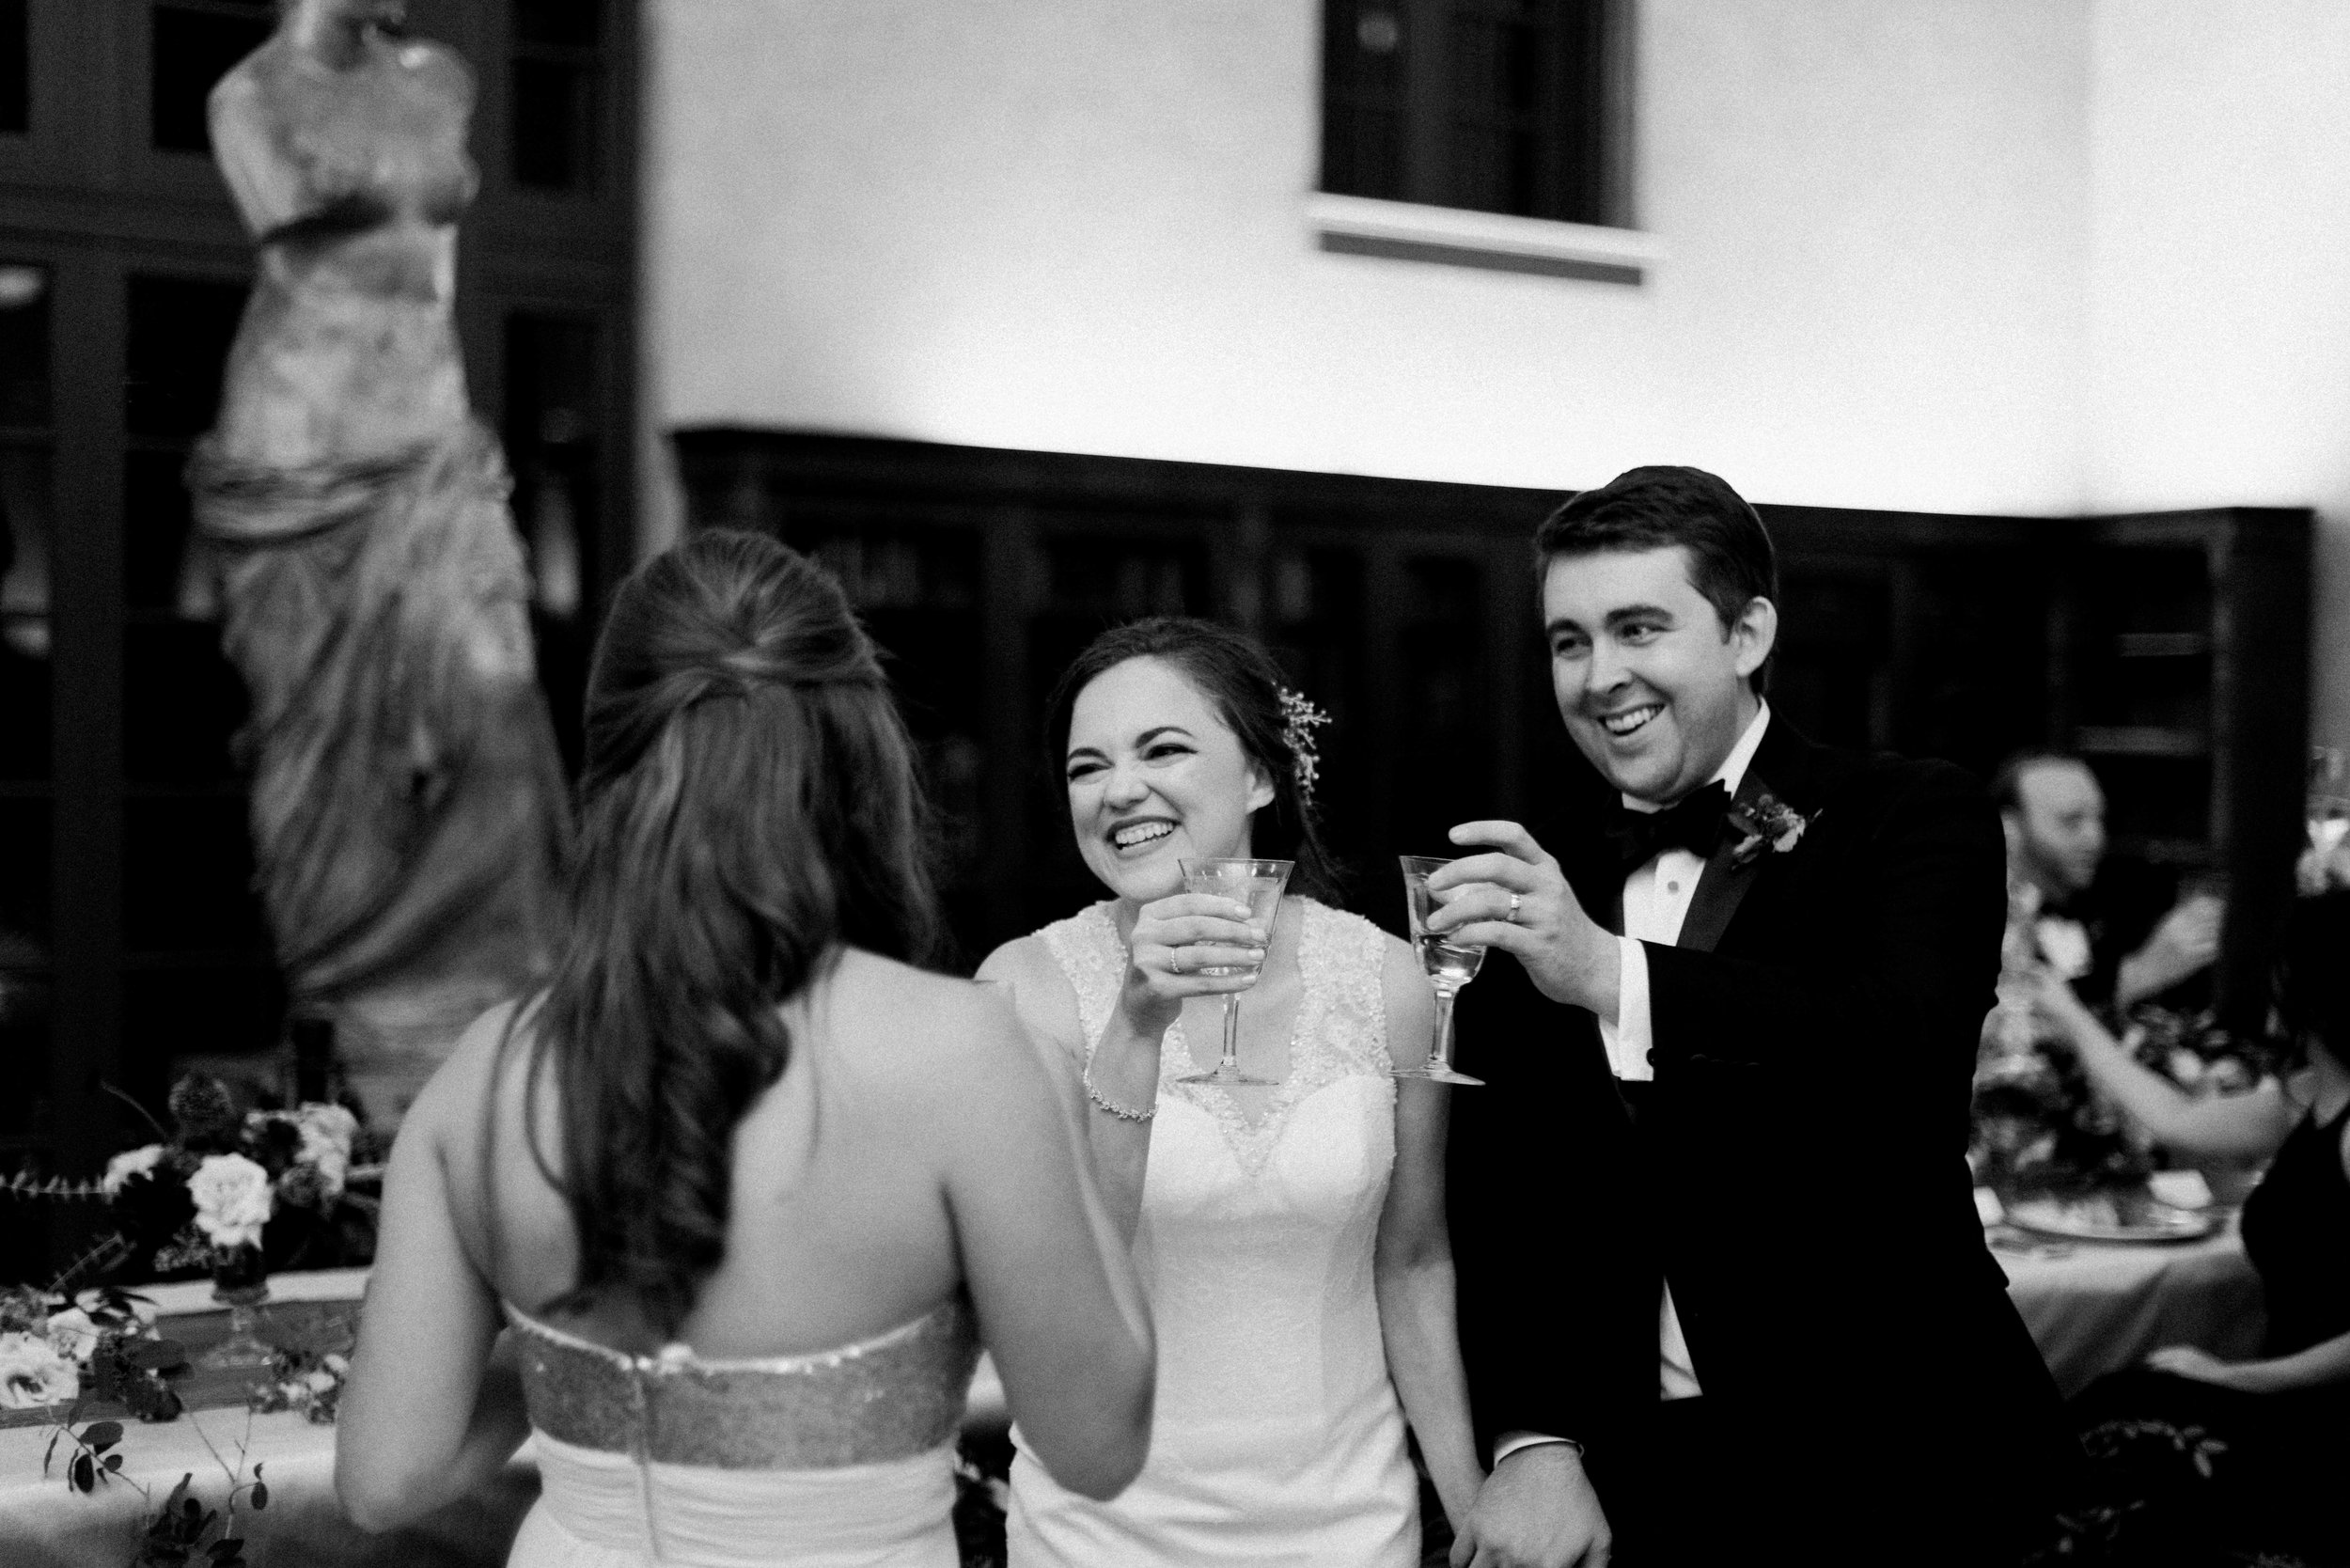 The-Knot-Texas-Fine-Art-Wedding-Film-Destination-Photographer-Houston-Austin-Dallas-New-Orleans-Julia-Ideson-Library-Event-Dana-Josh-Fernandez-Photograph-Top-Best-84.jpg